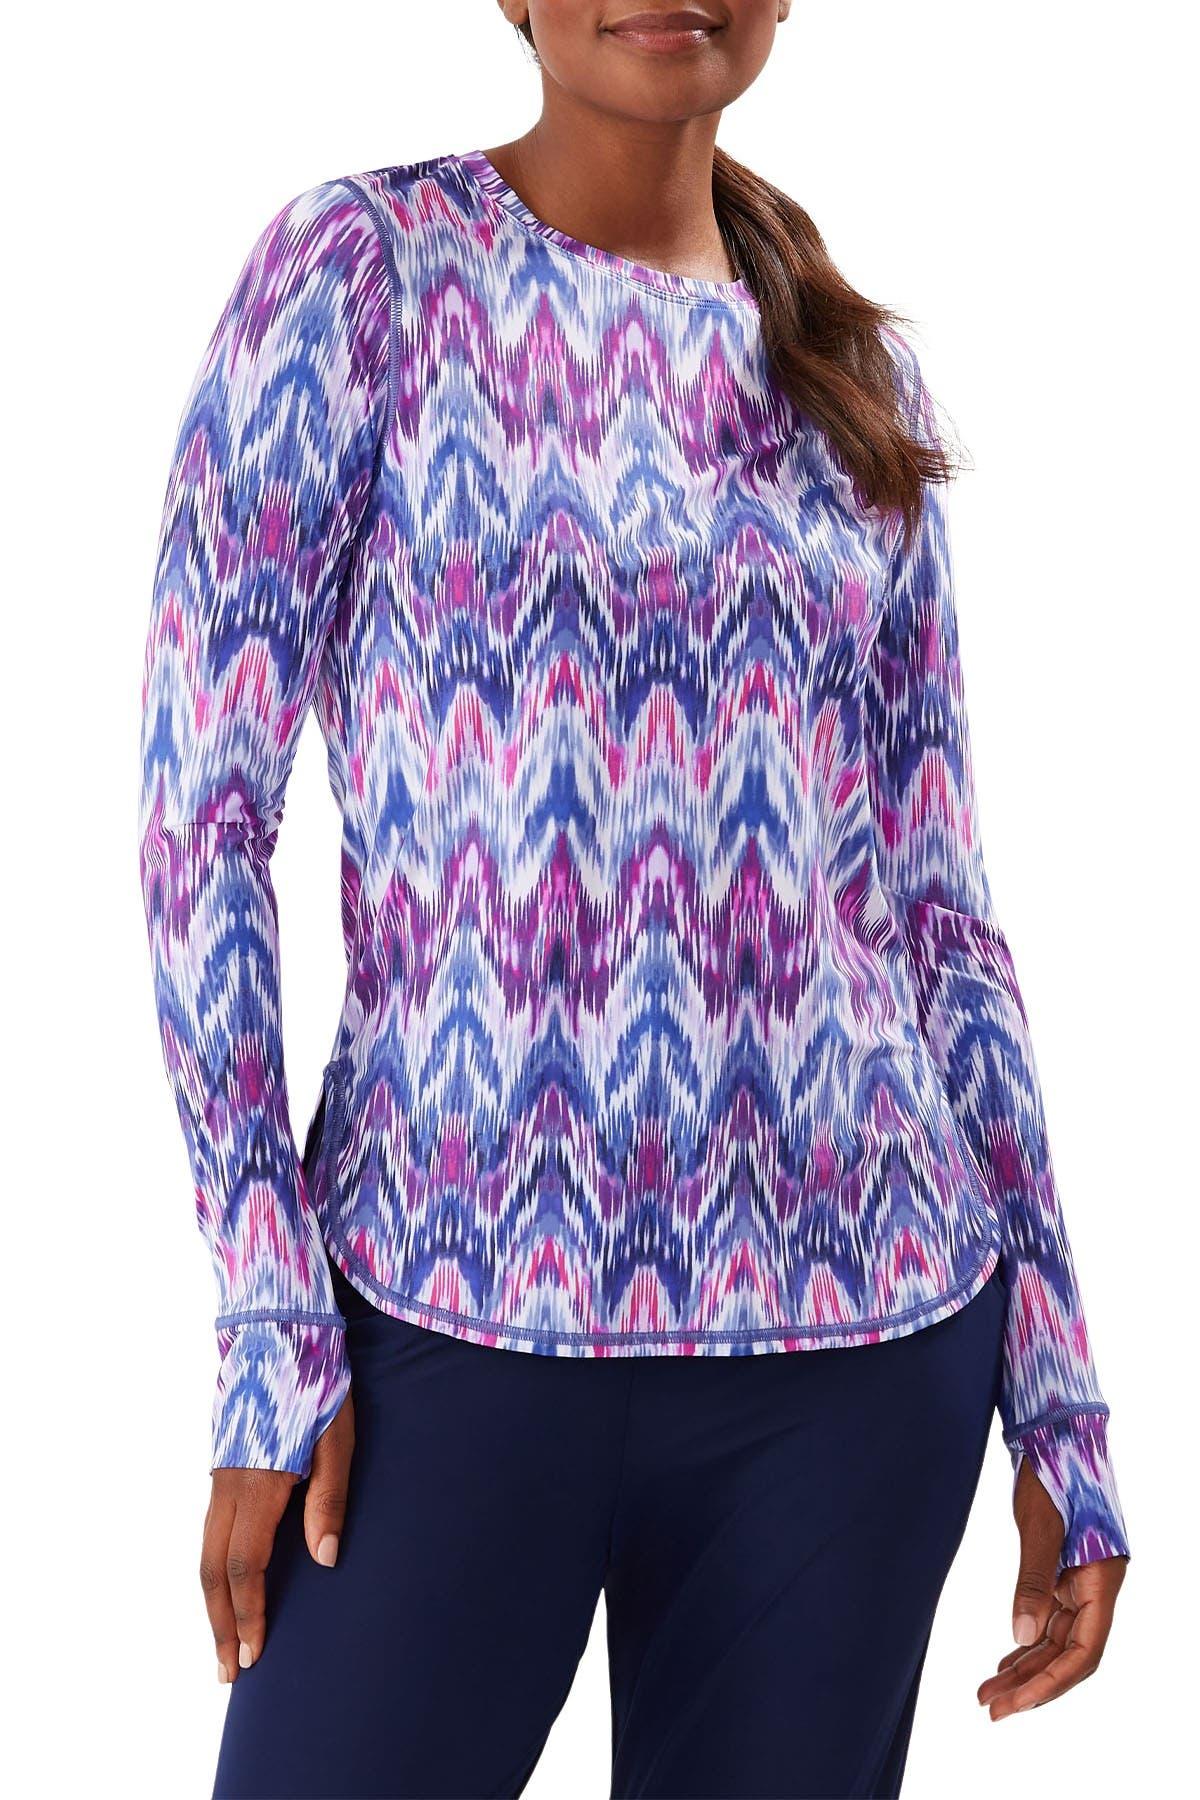 Image of Tommy Bahama Ikat Mirage Geometric Print Long Sleeve Relaxed T-Shirt